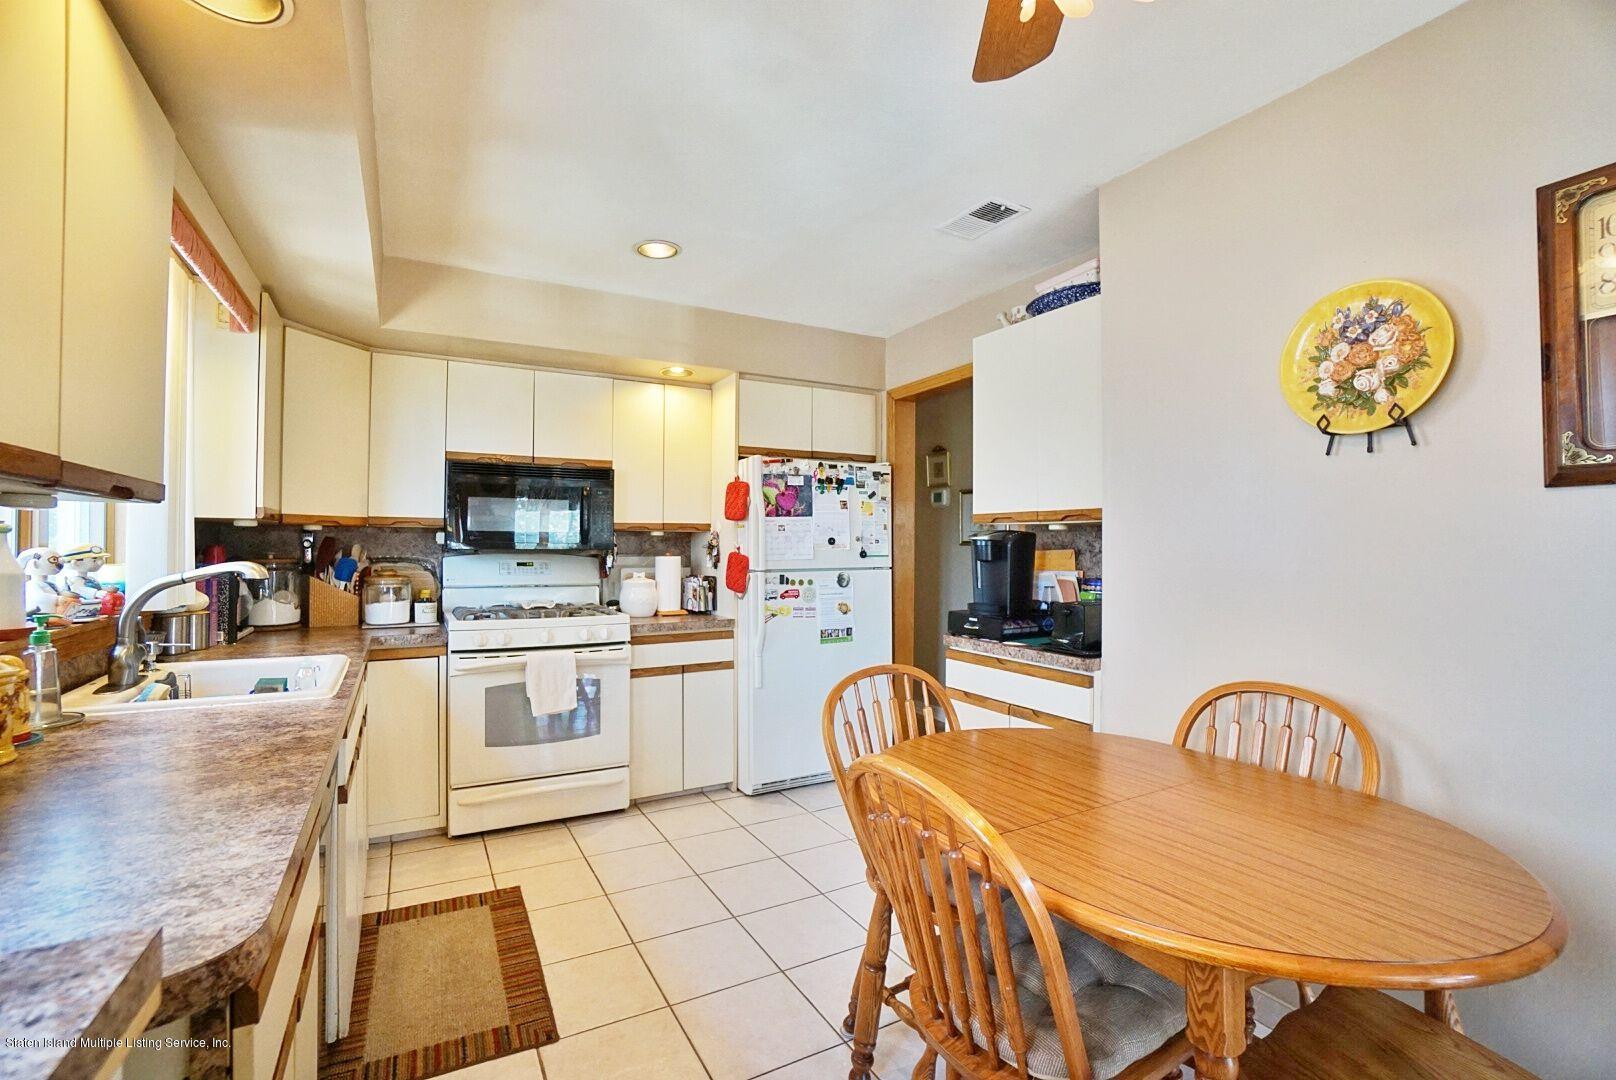 Single Family - Detached 283 Holdridge Avenue  Staten Island, NY 10312, MLS-1130000-22